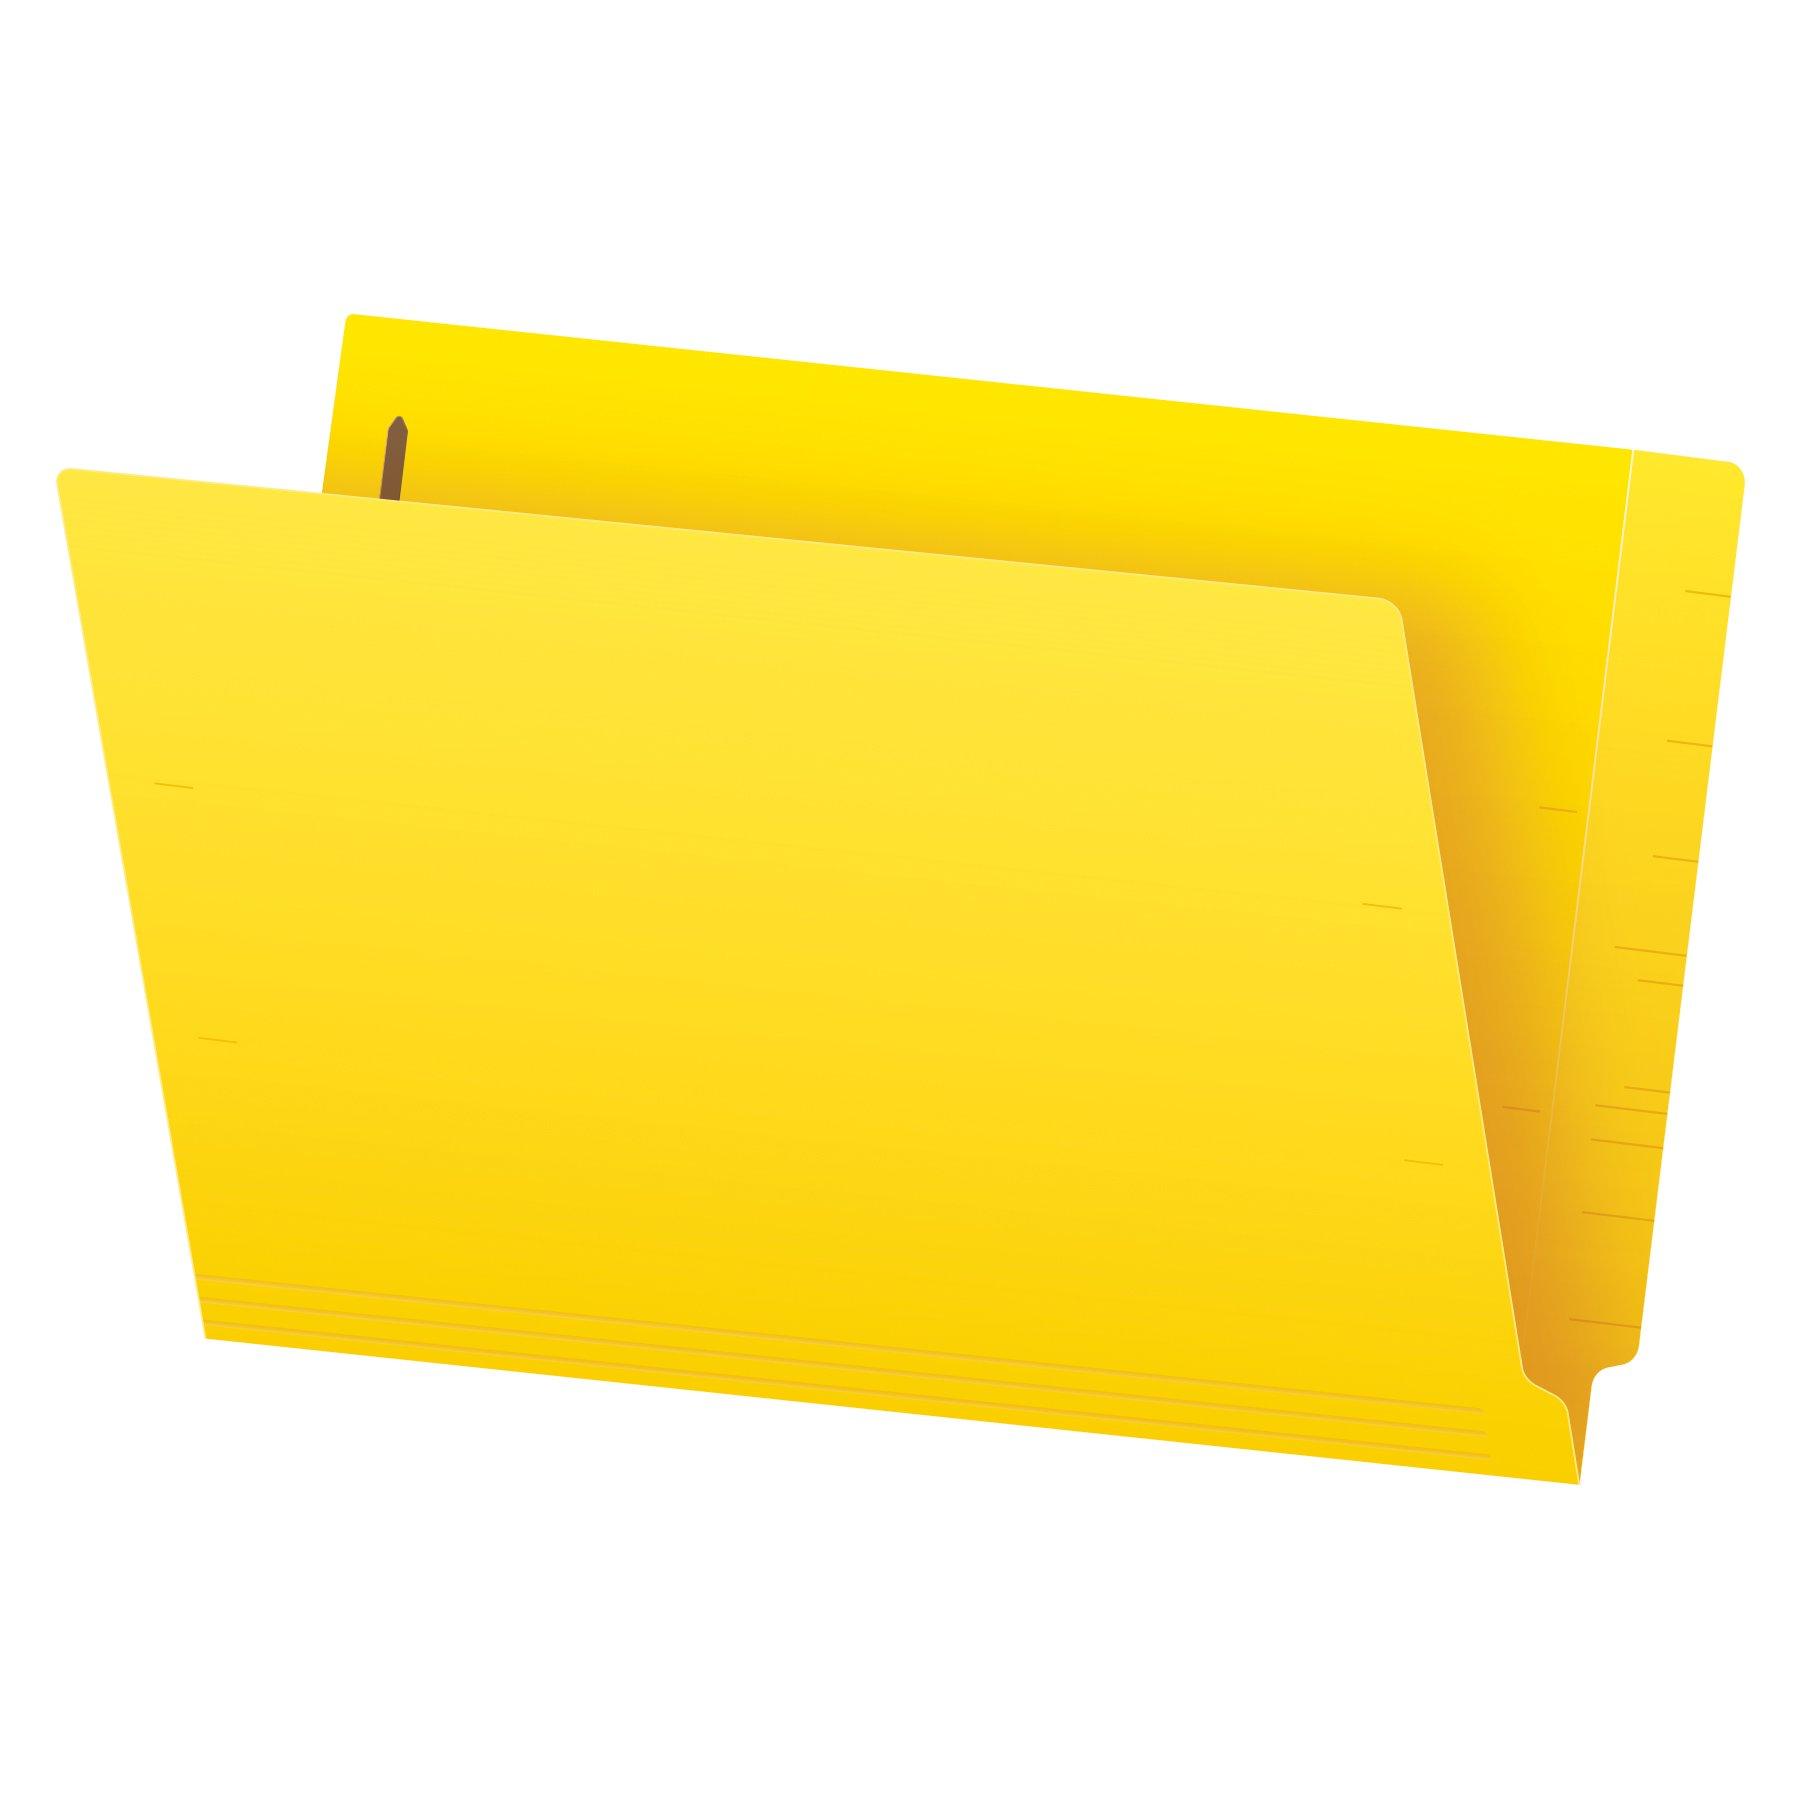 Pendaflex Color End-Tab Fastener Folders, Legal Size, Yellow, Straight Cut, 50/BX (48940)